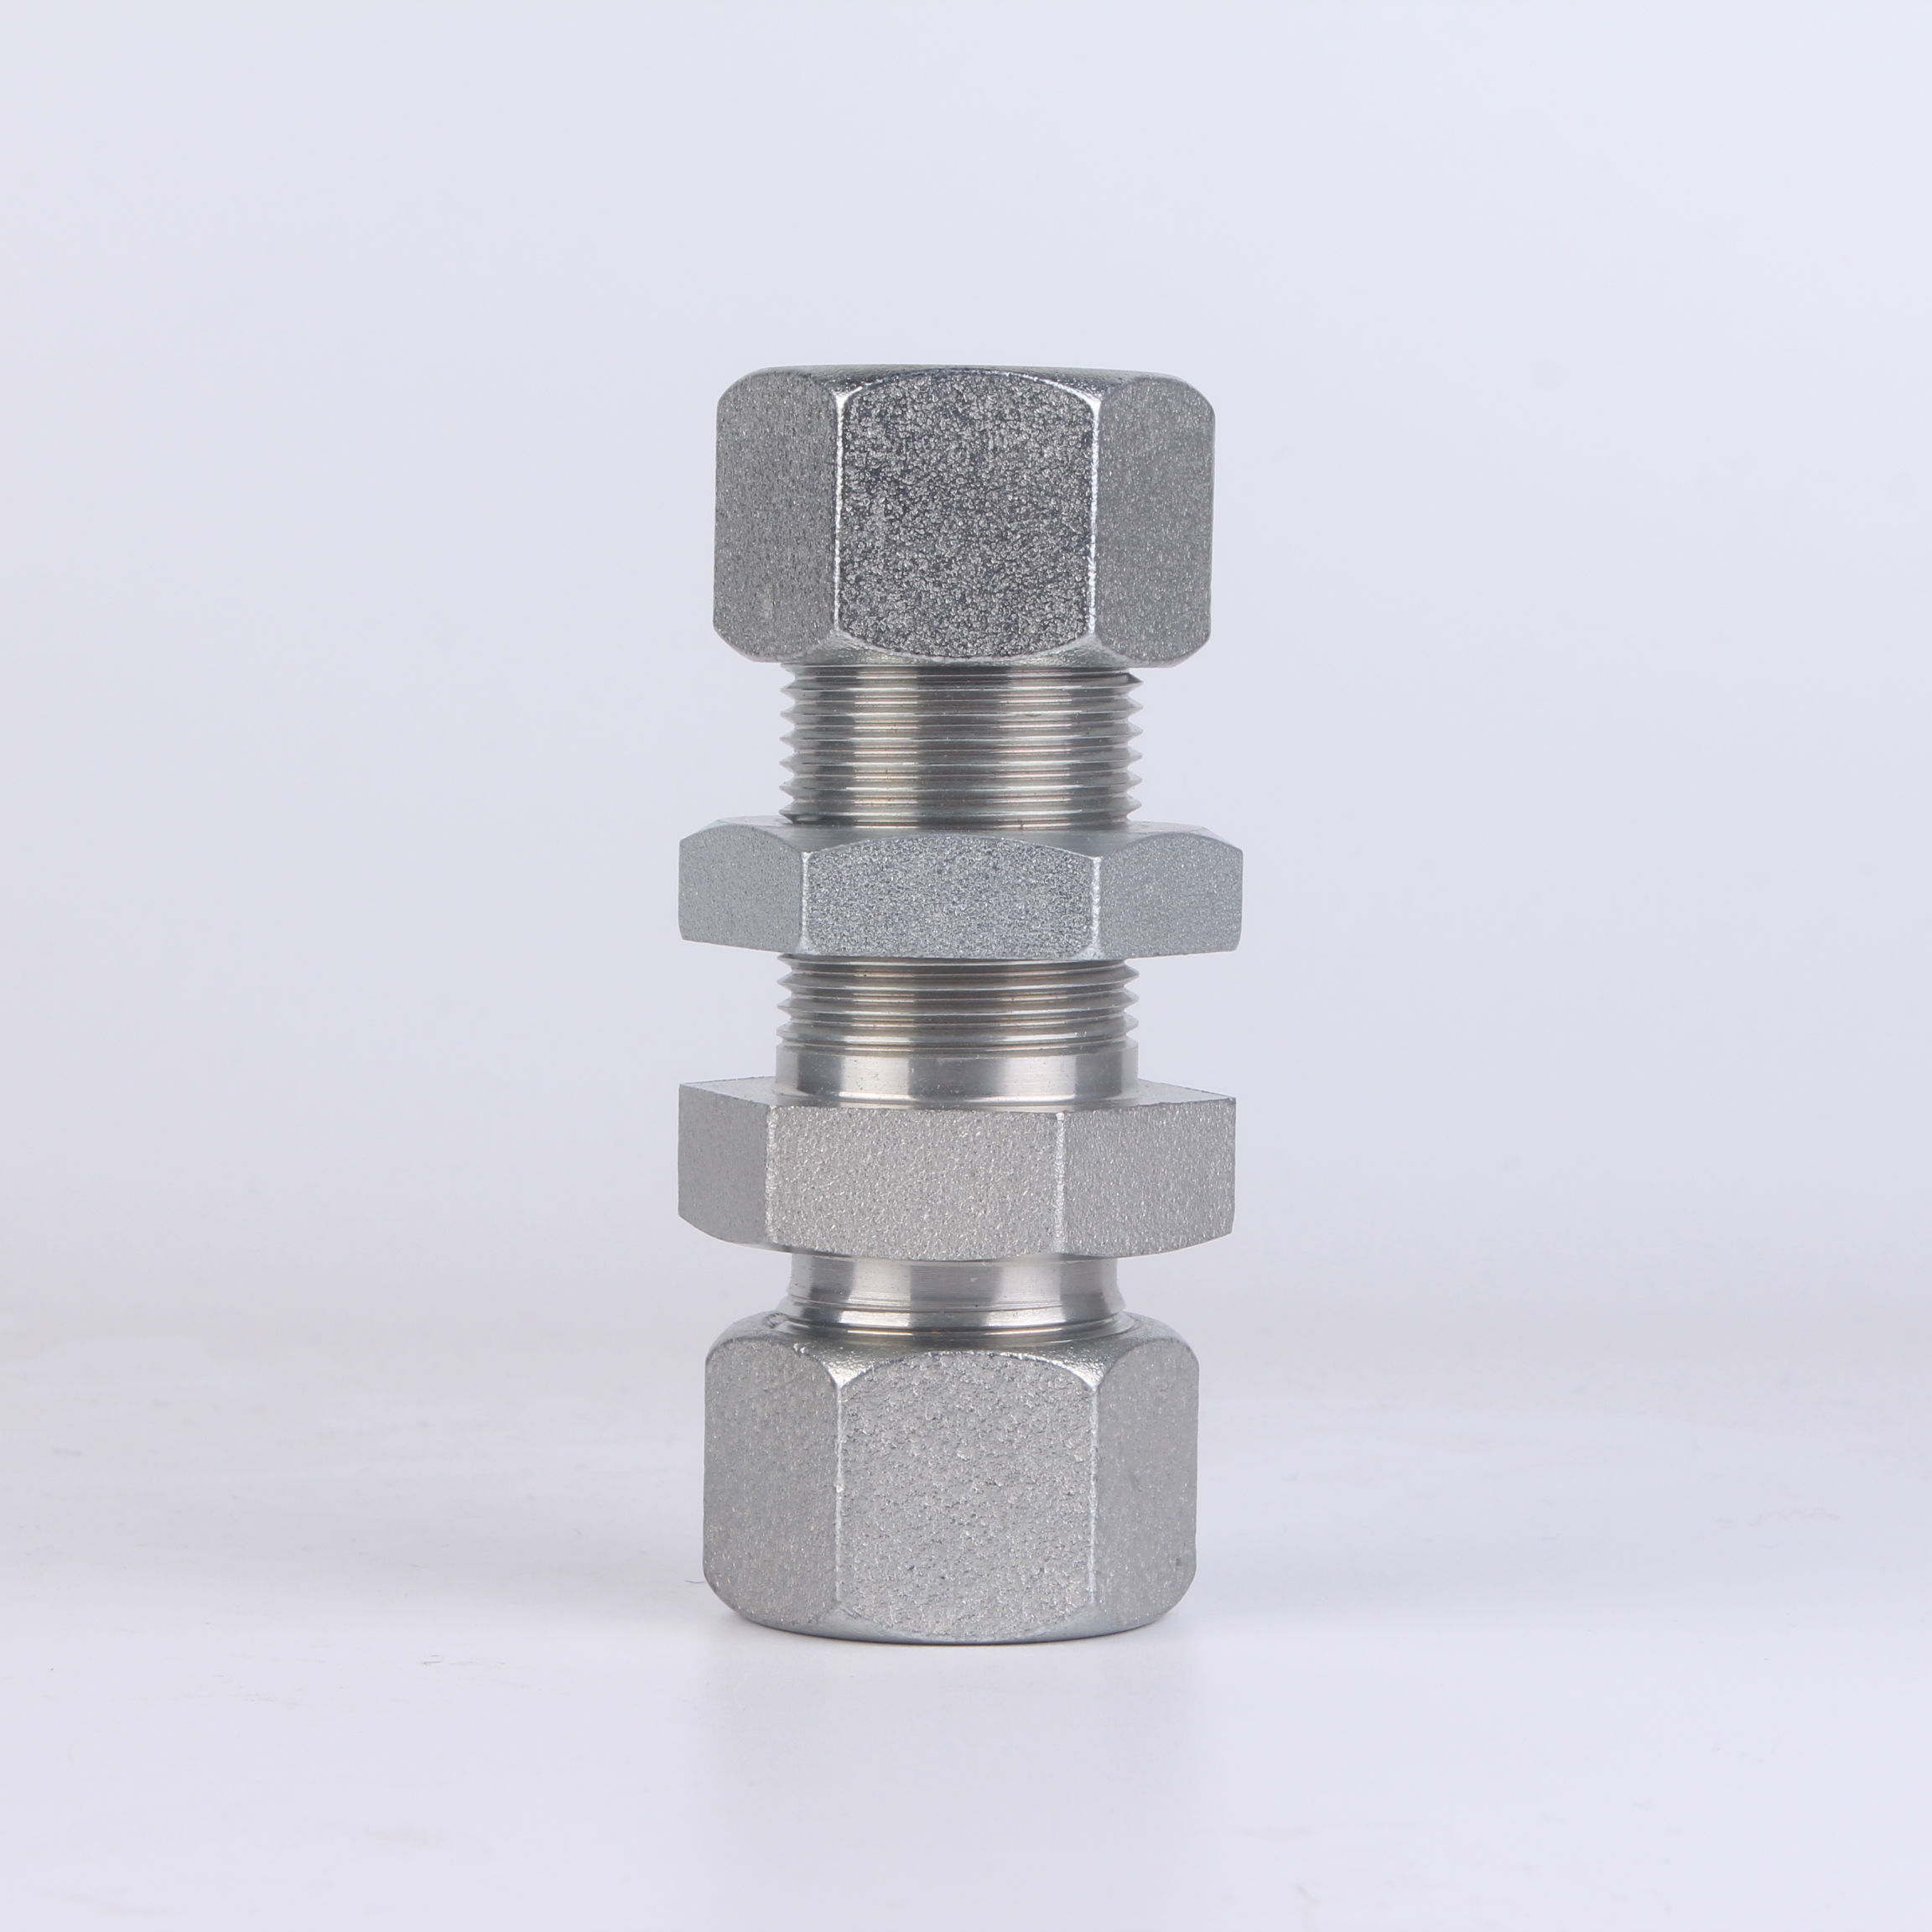 "Adaptador Hidráulico 1//2/"" BSP MacHo X 1//2 BSP Giratoria Hembra 60 ° bomba de cono de acero"